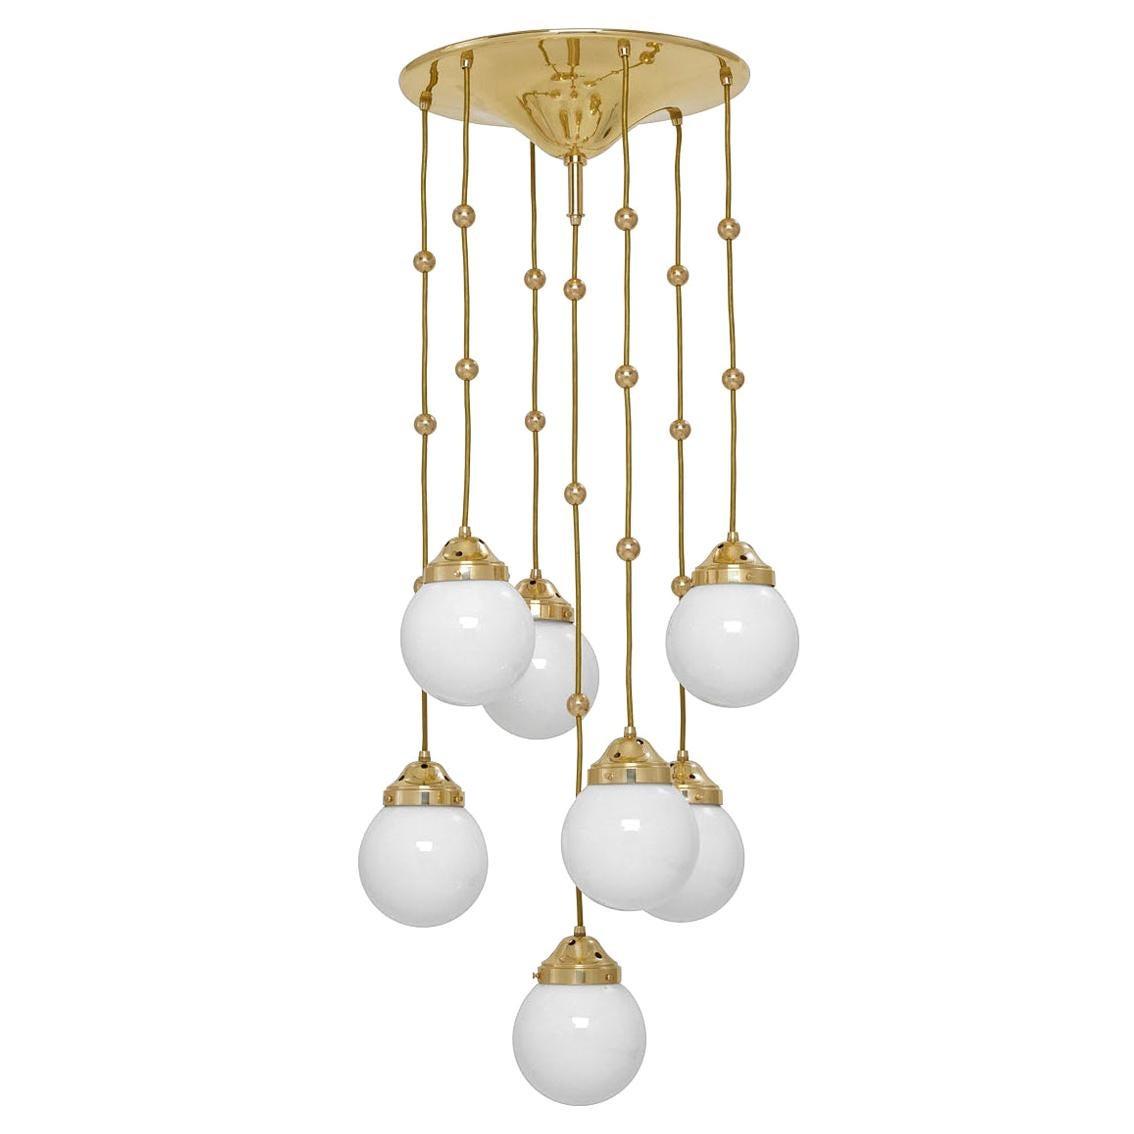 Koloman Moser, Josef Hoffmann & Wiener Werkstätte Ceiling Lamp, Re-Edition